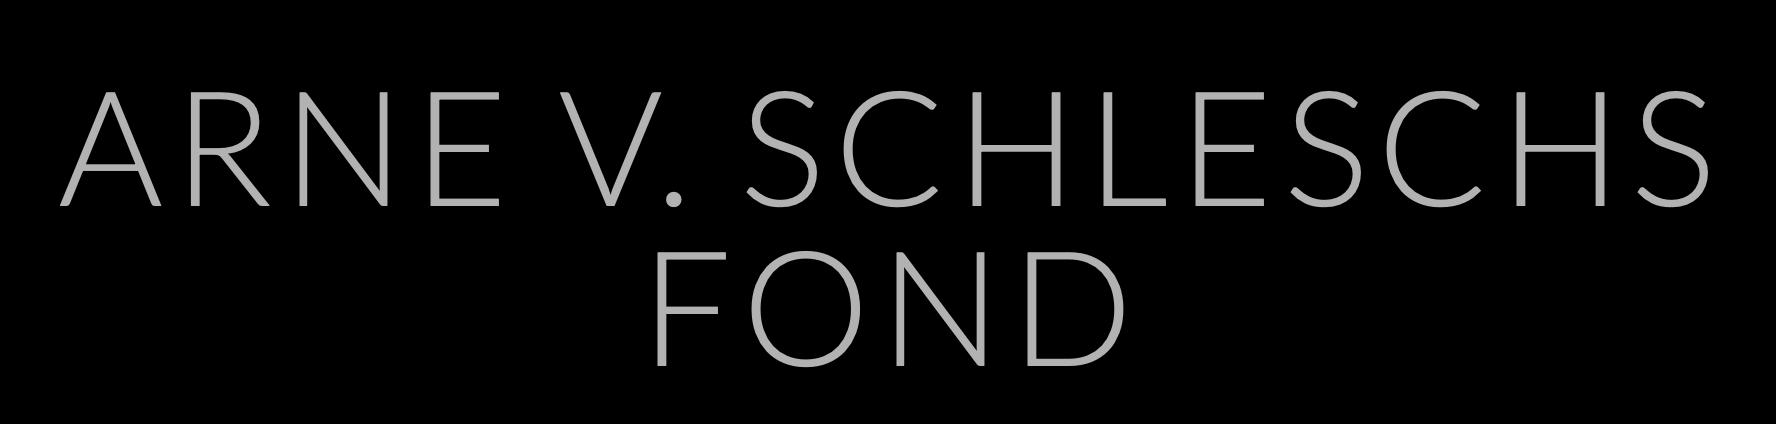 Arne V. Schleschs Fond